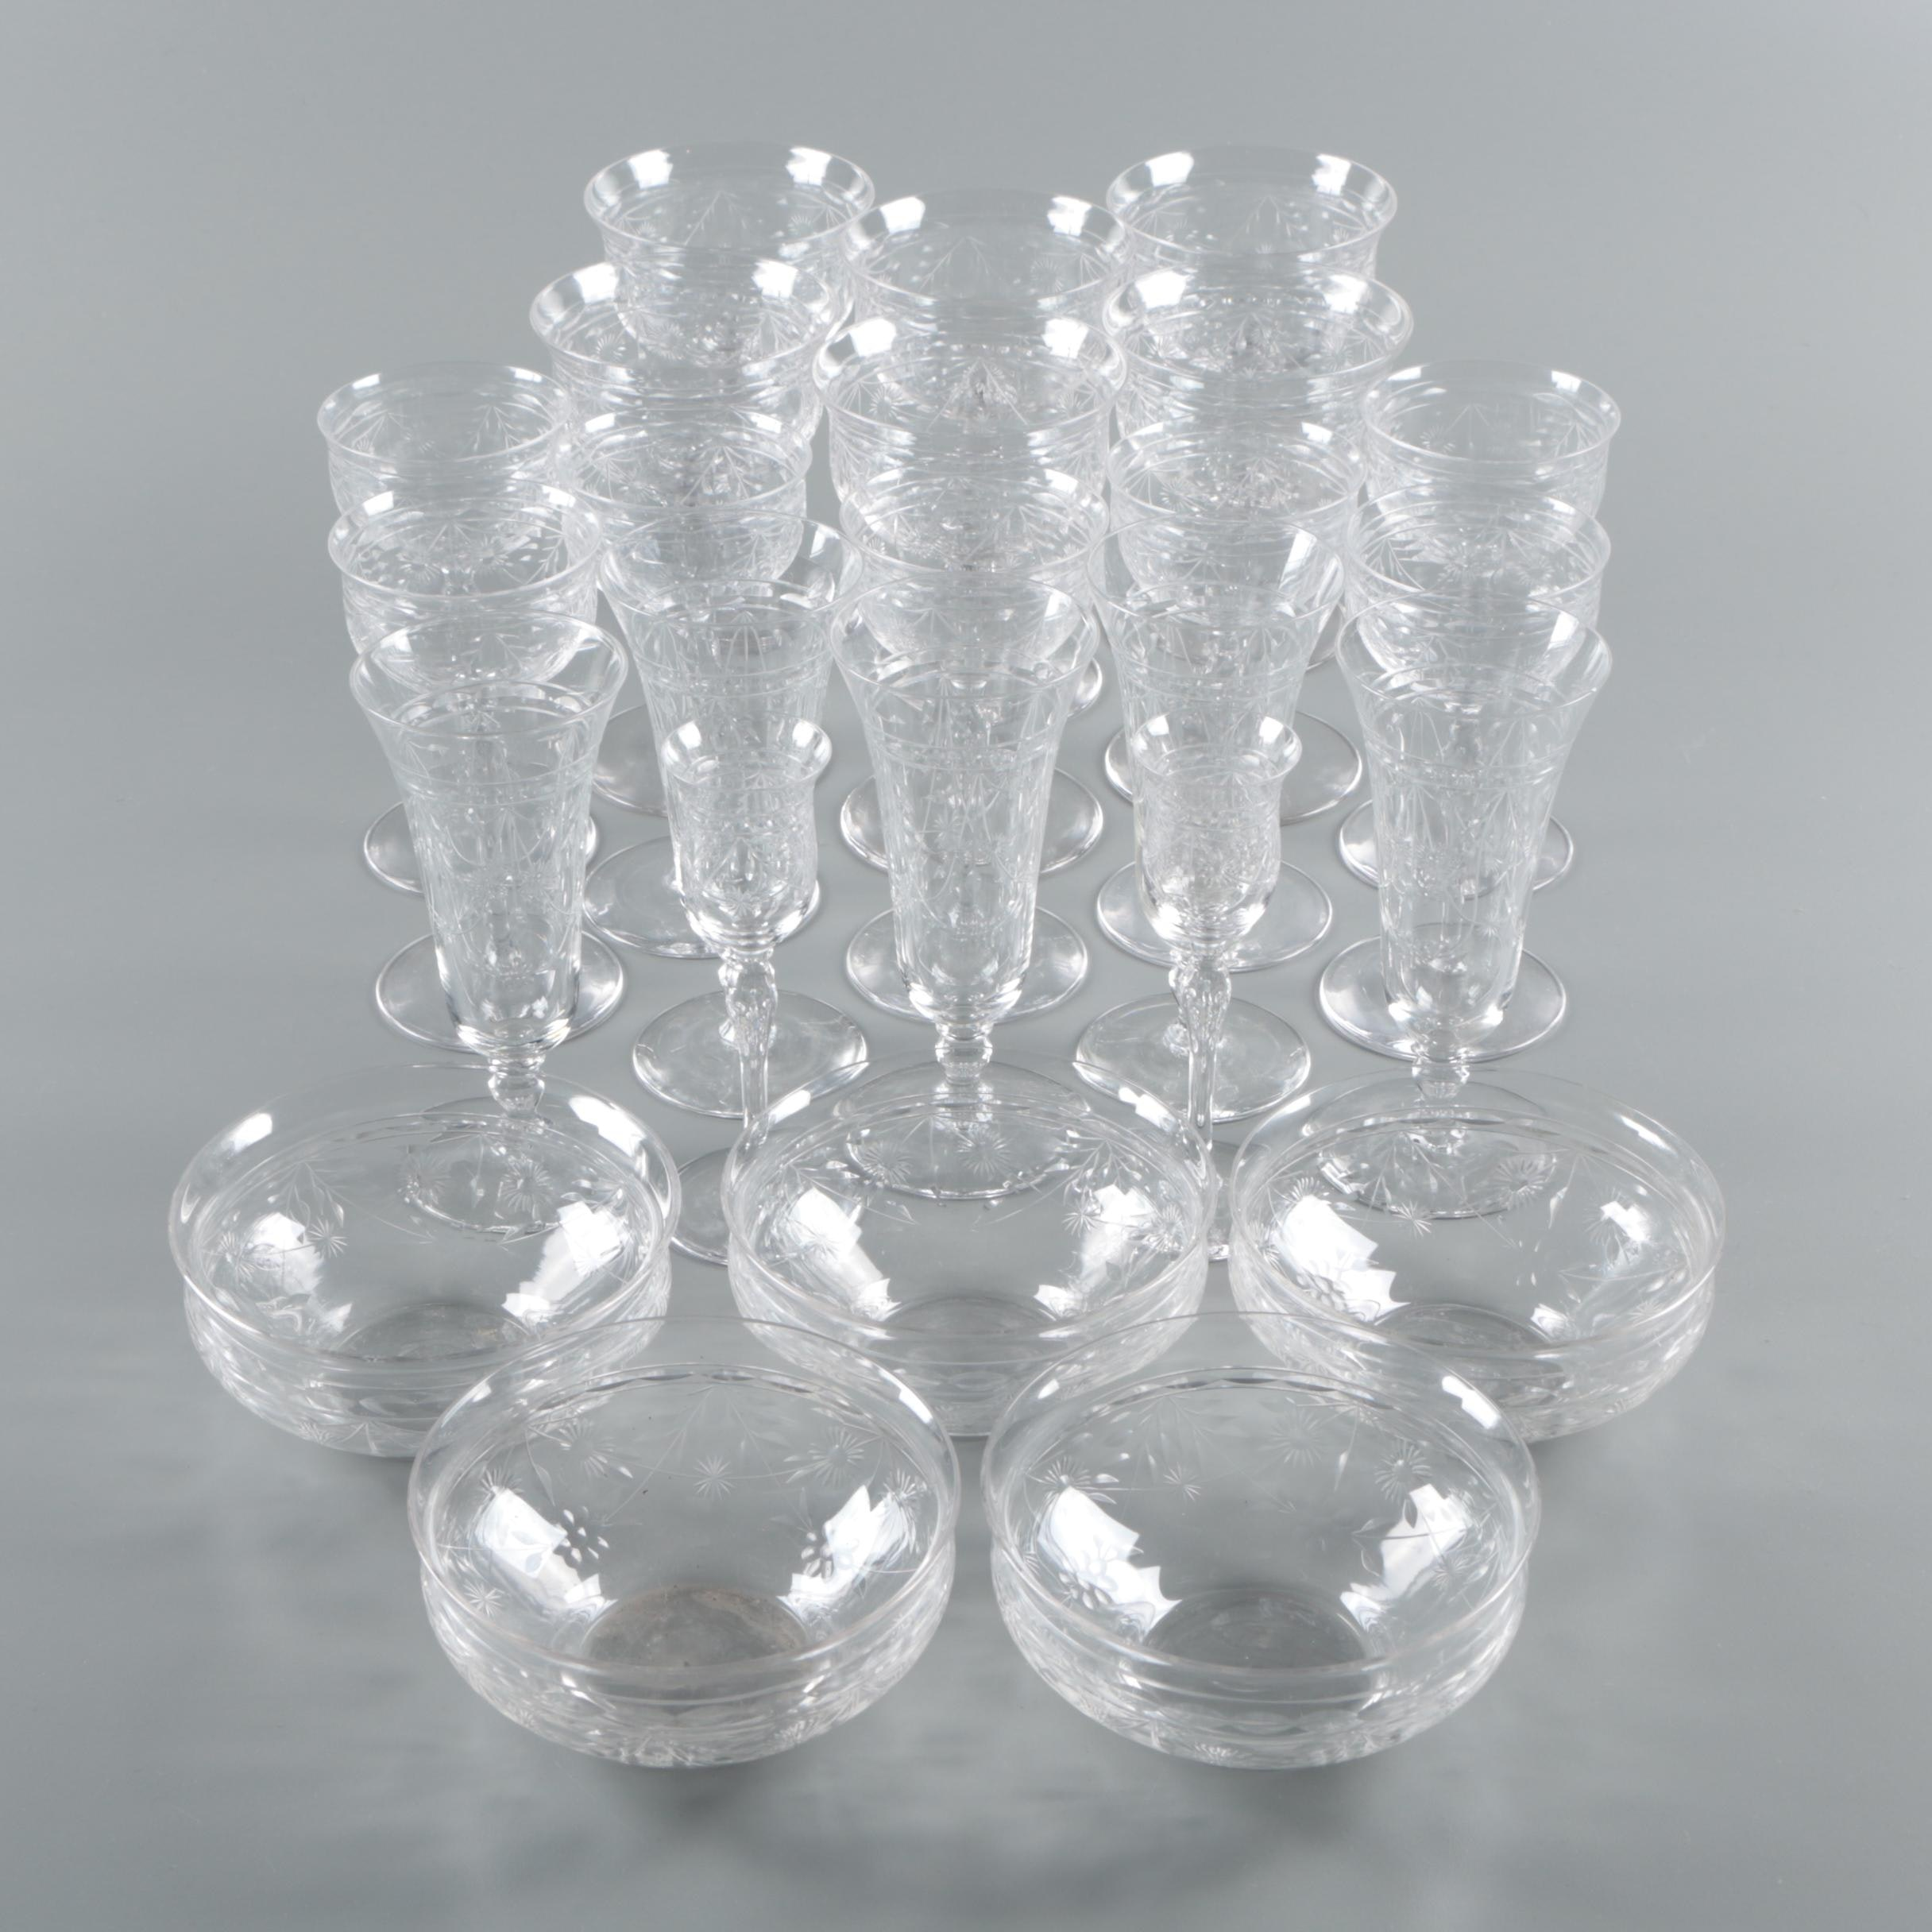 Vintage Floral Cut Glass Stemware and Finger Bowls